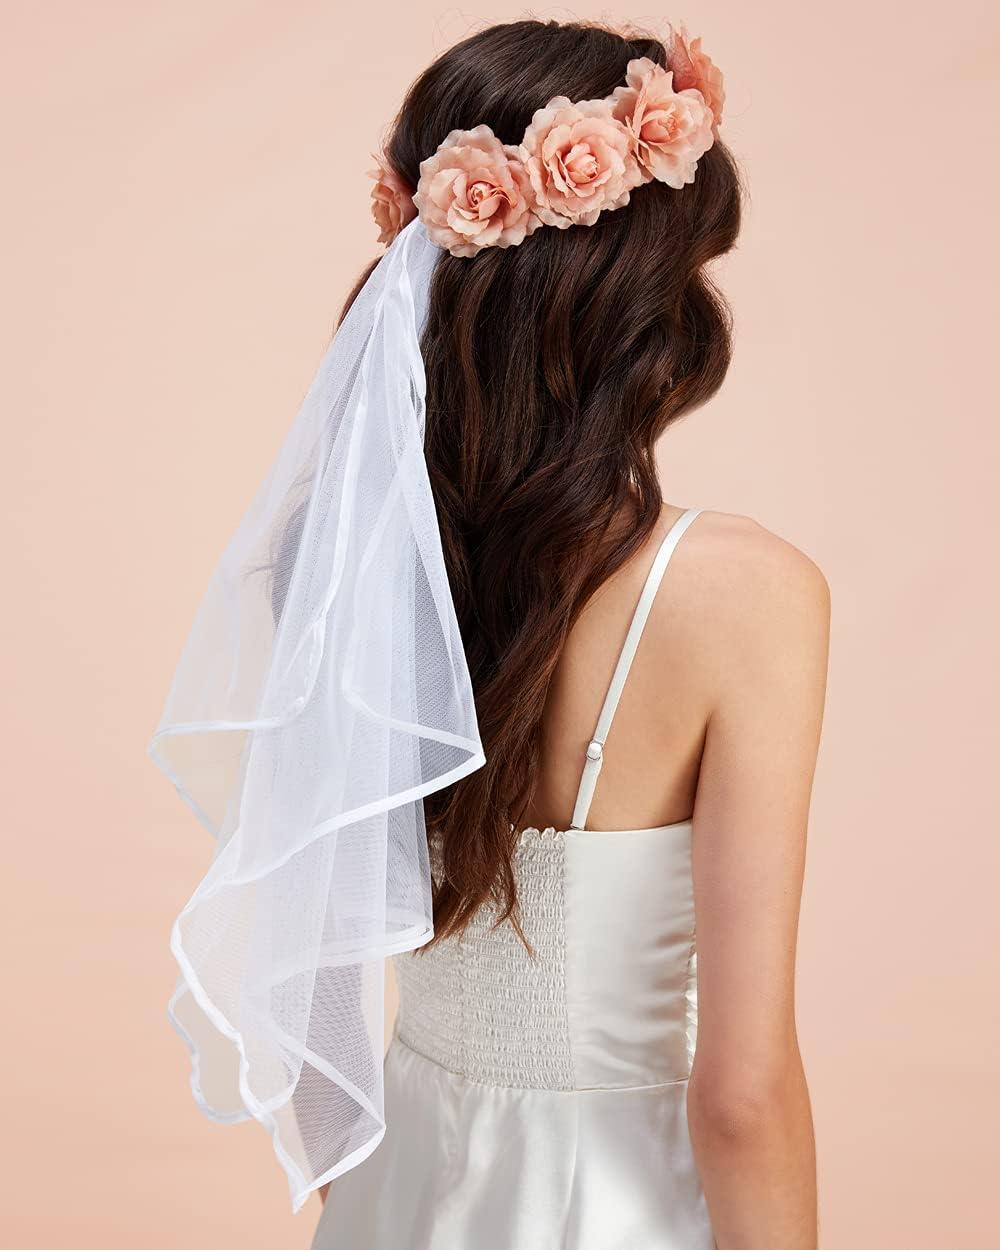 xo, Fetti Bachelorette Party Decorations Veil - Rose Gold Flower Veil   Bridal Shower Crown   Bride to Be Gift + Engagement Decorations